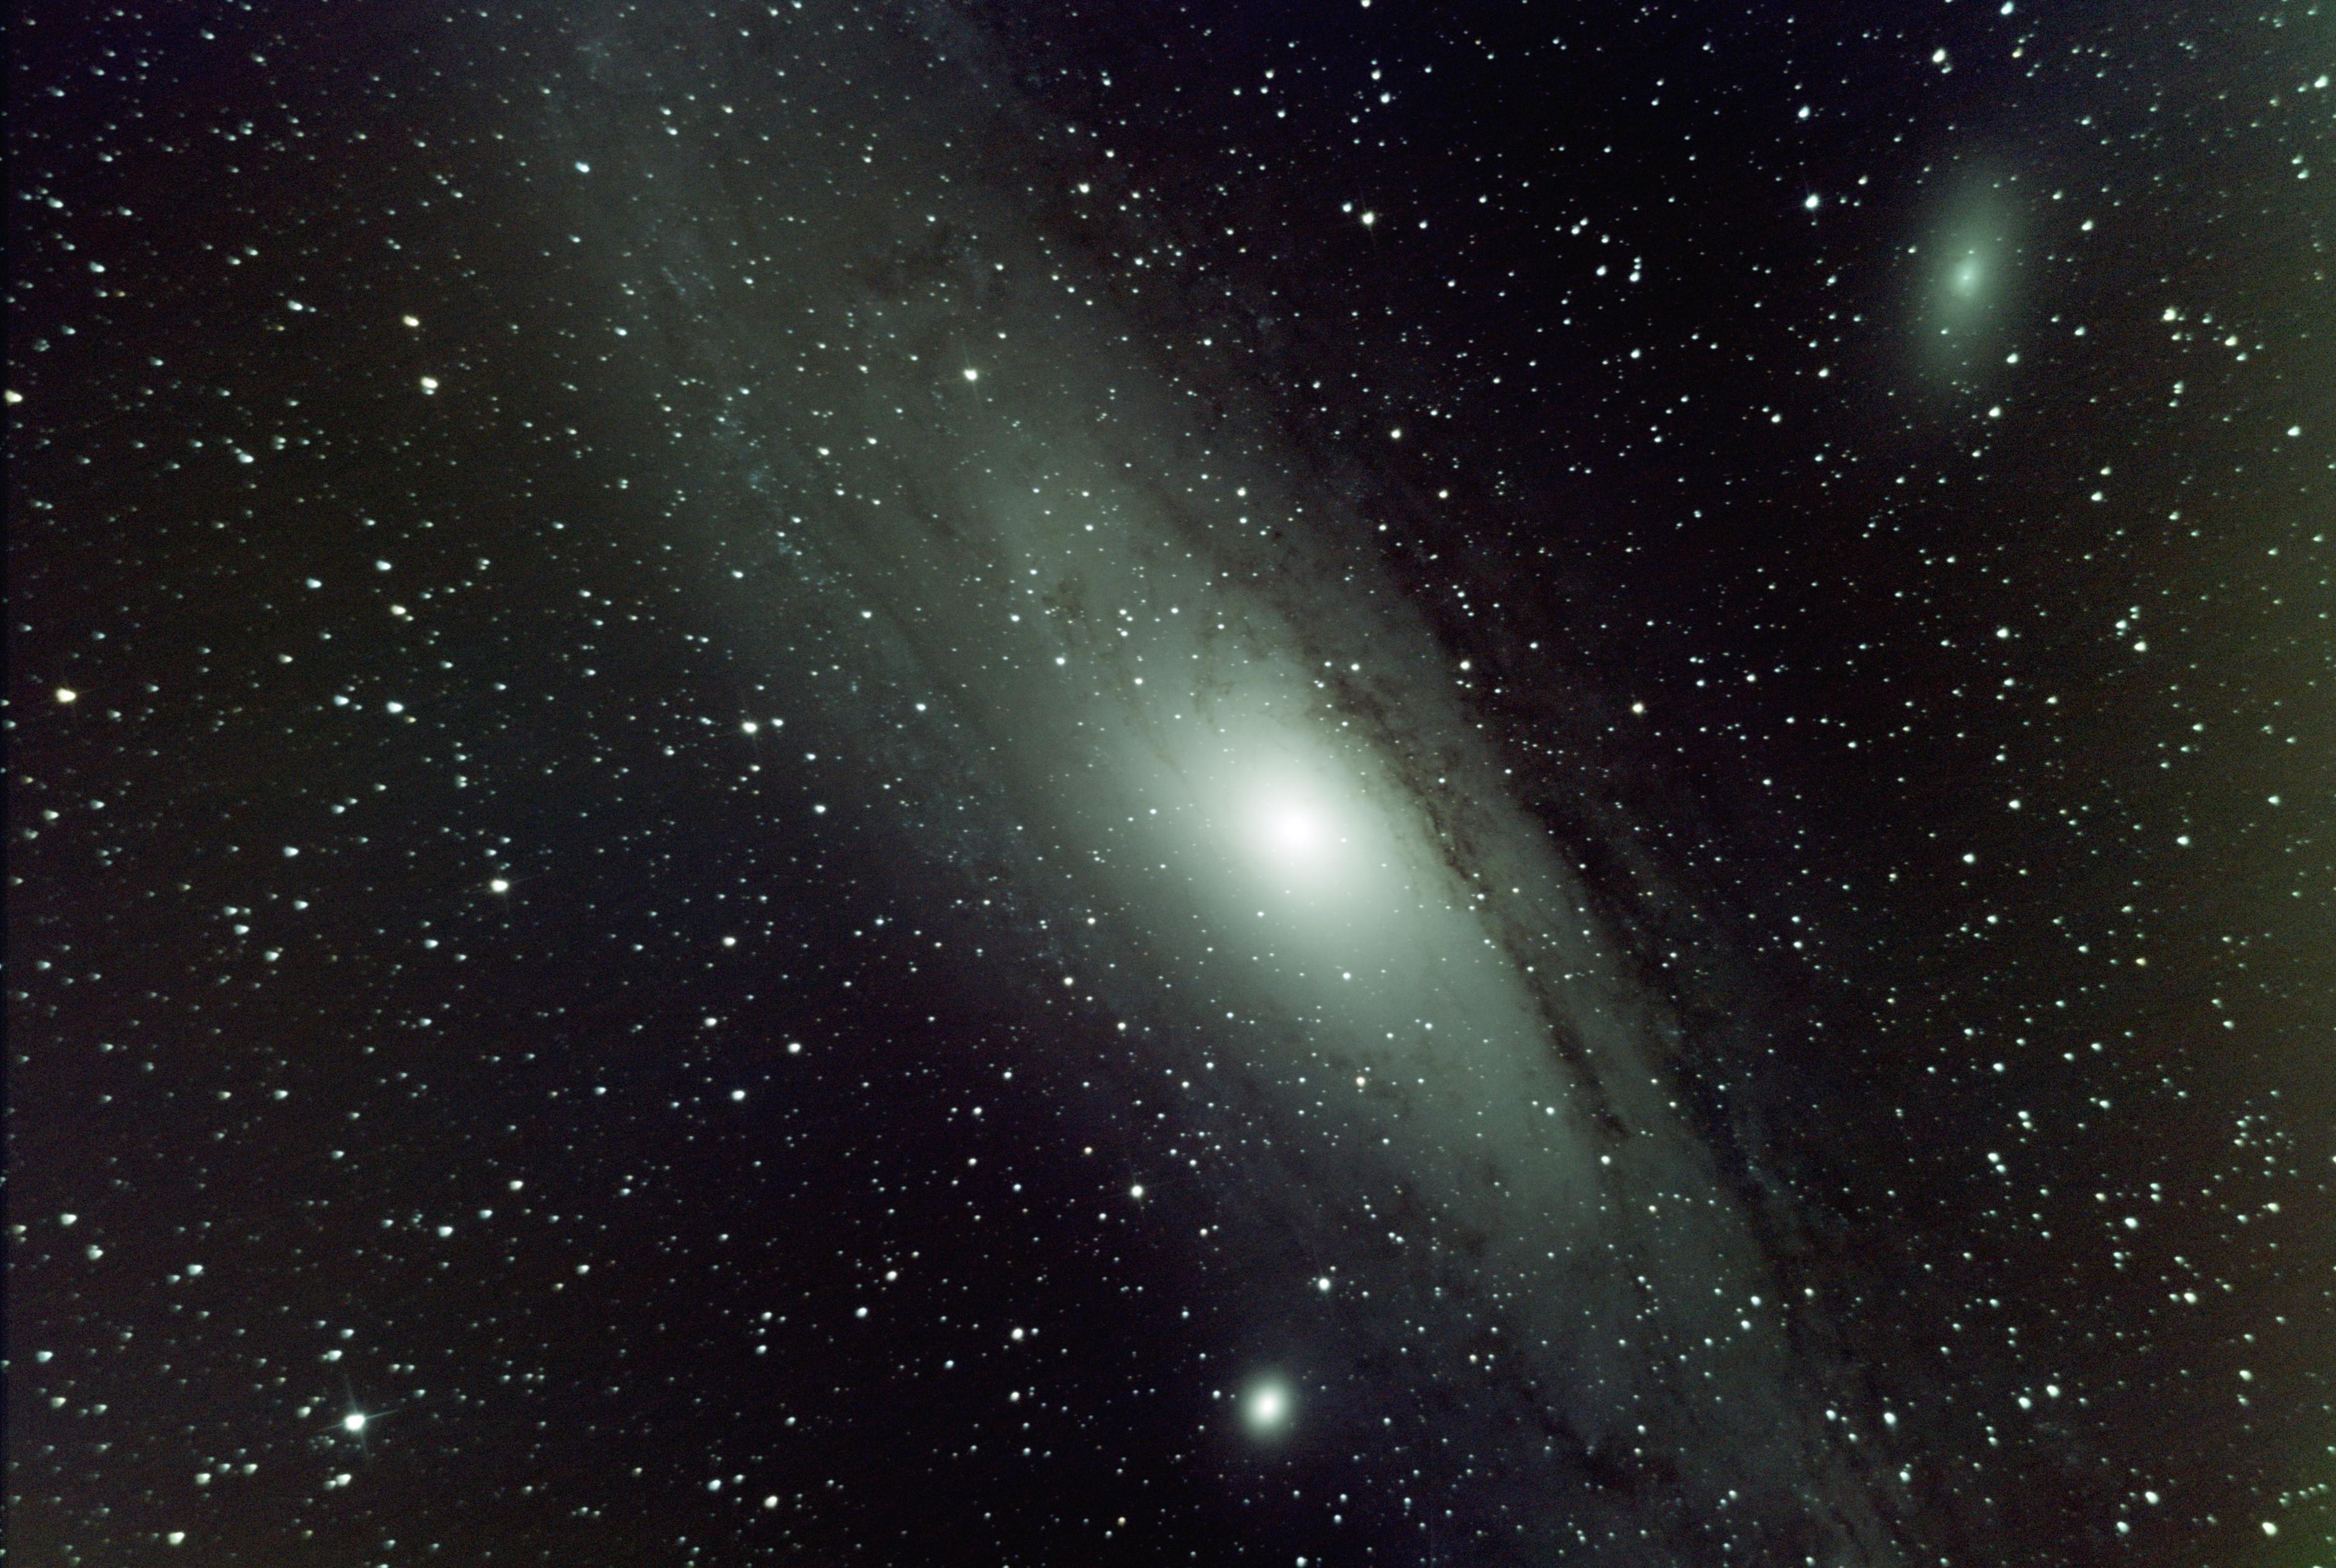 M31 Galaxie d'Andromède M31-0040G0020R